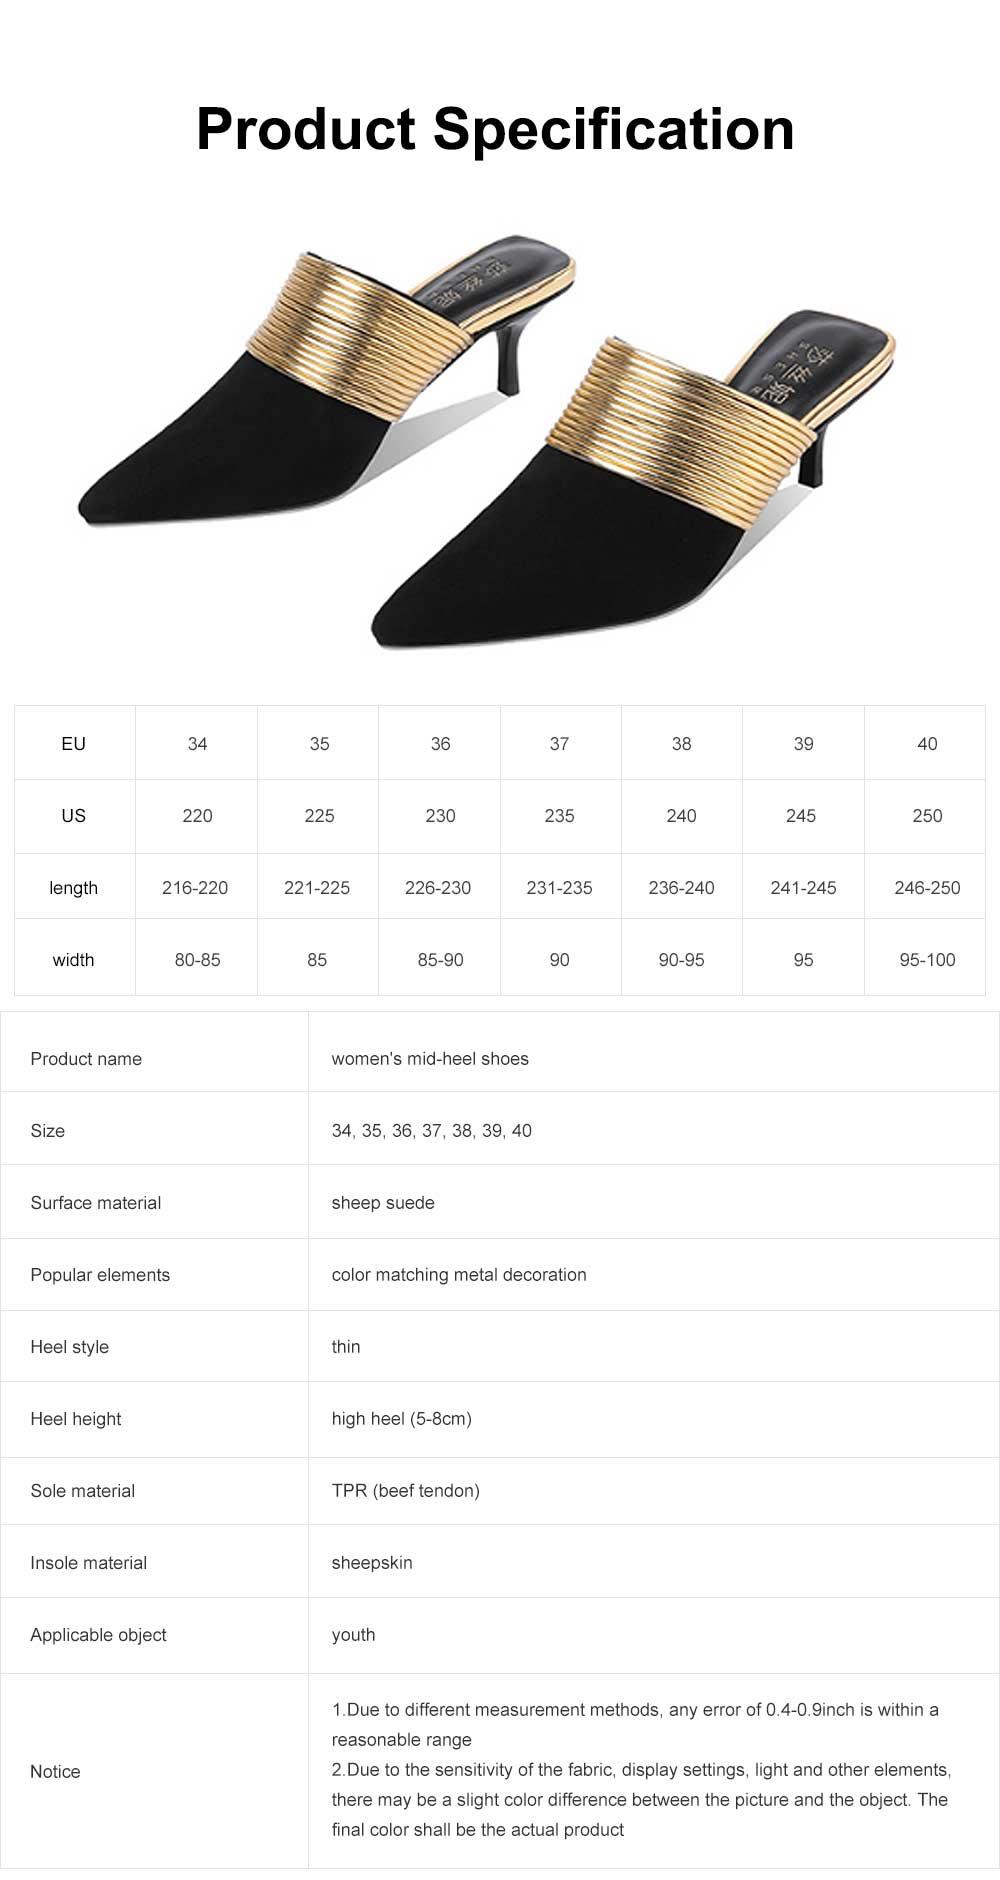 Women's Mid-heel Half Warped Shoes, Comfortable Pointed Toe Casual Shoe, Fashion Pure Color Slim Heel Stiletto Heels 6